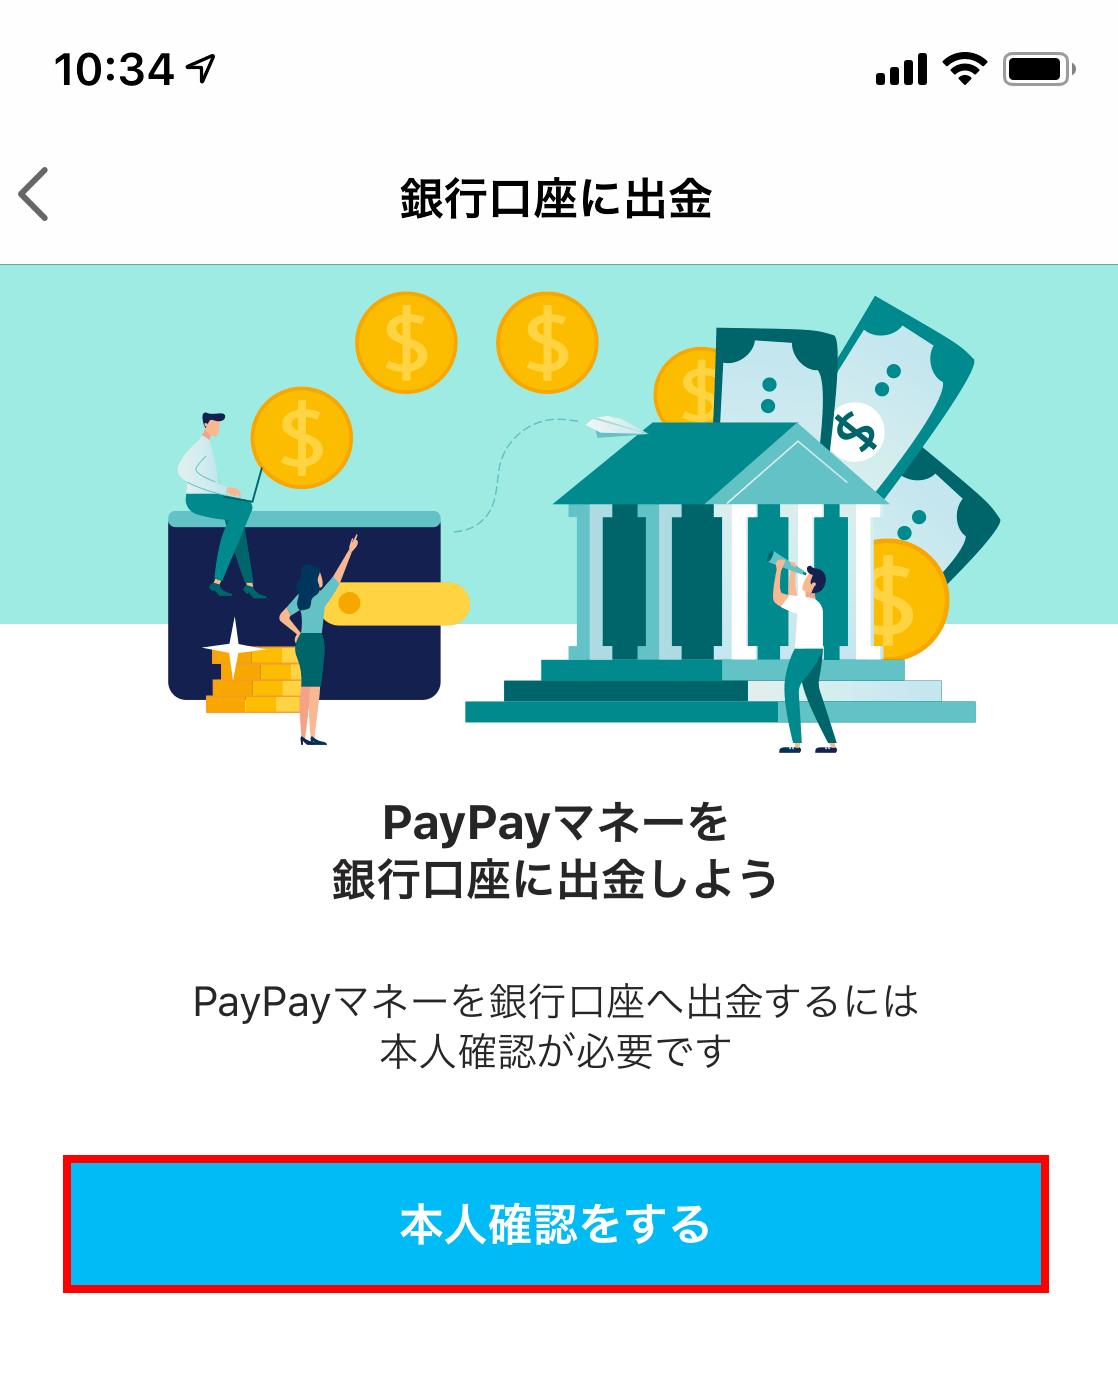 Pay Pay 出金